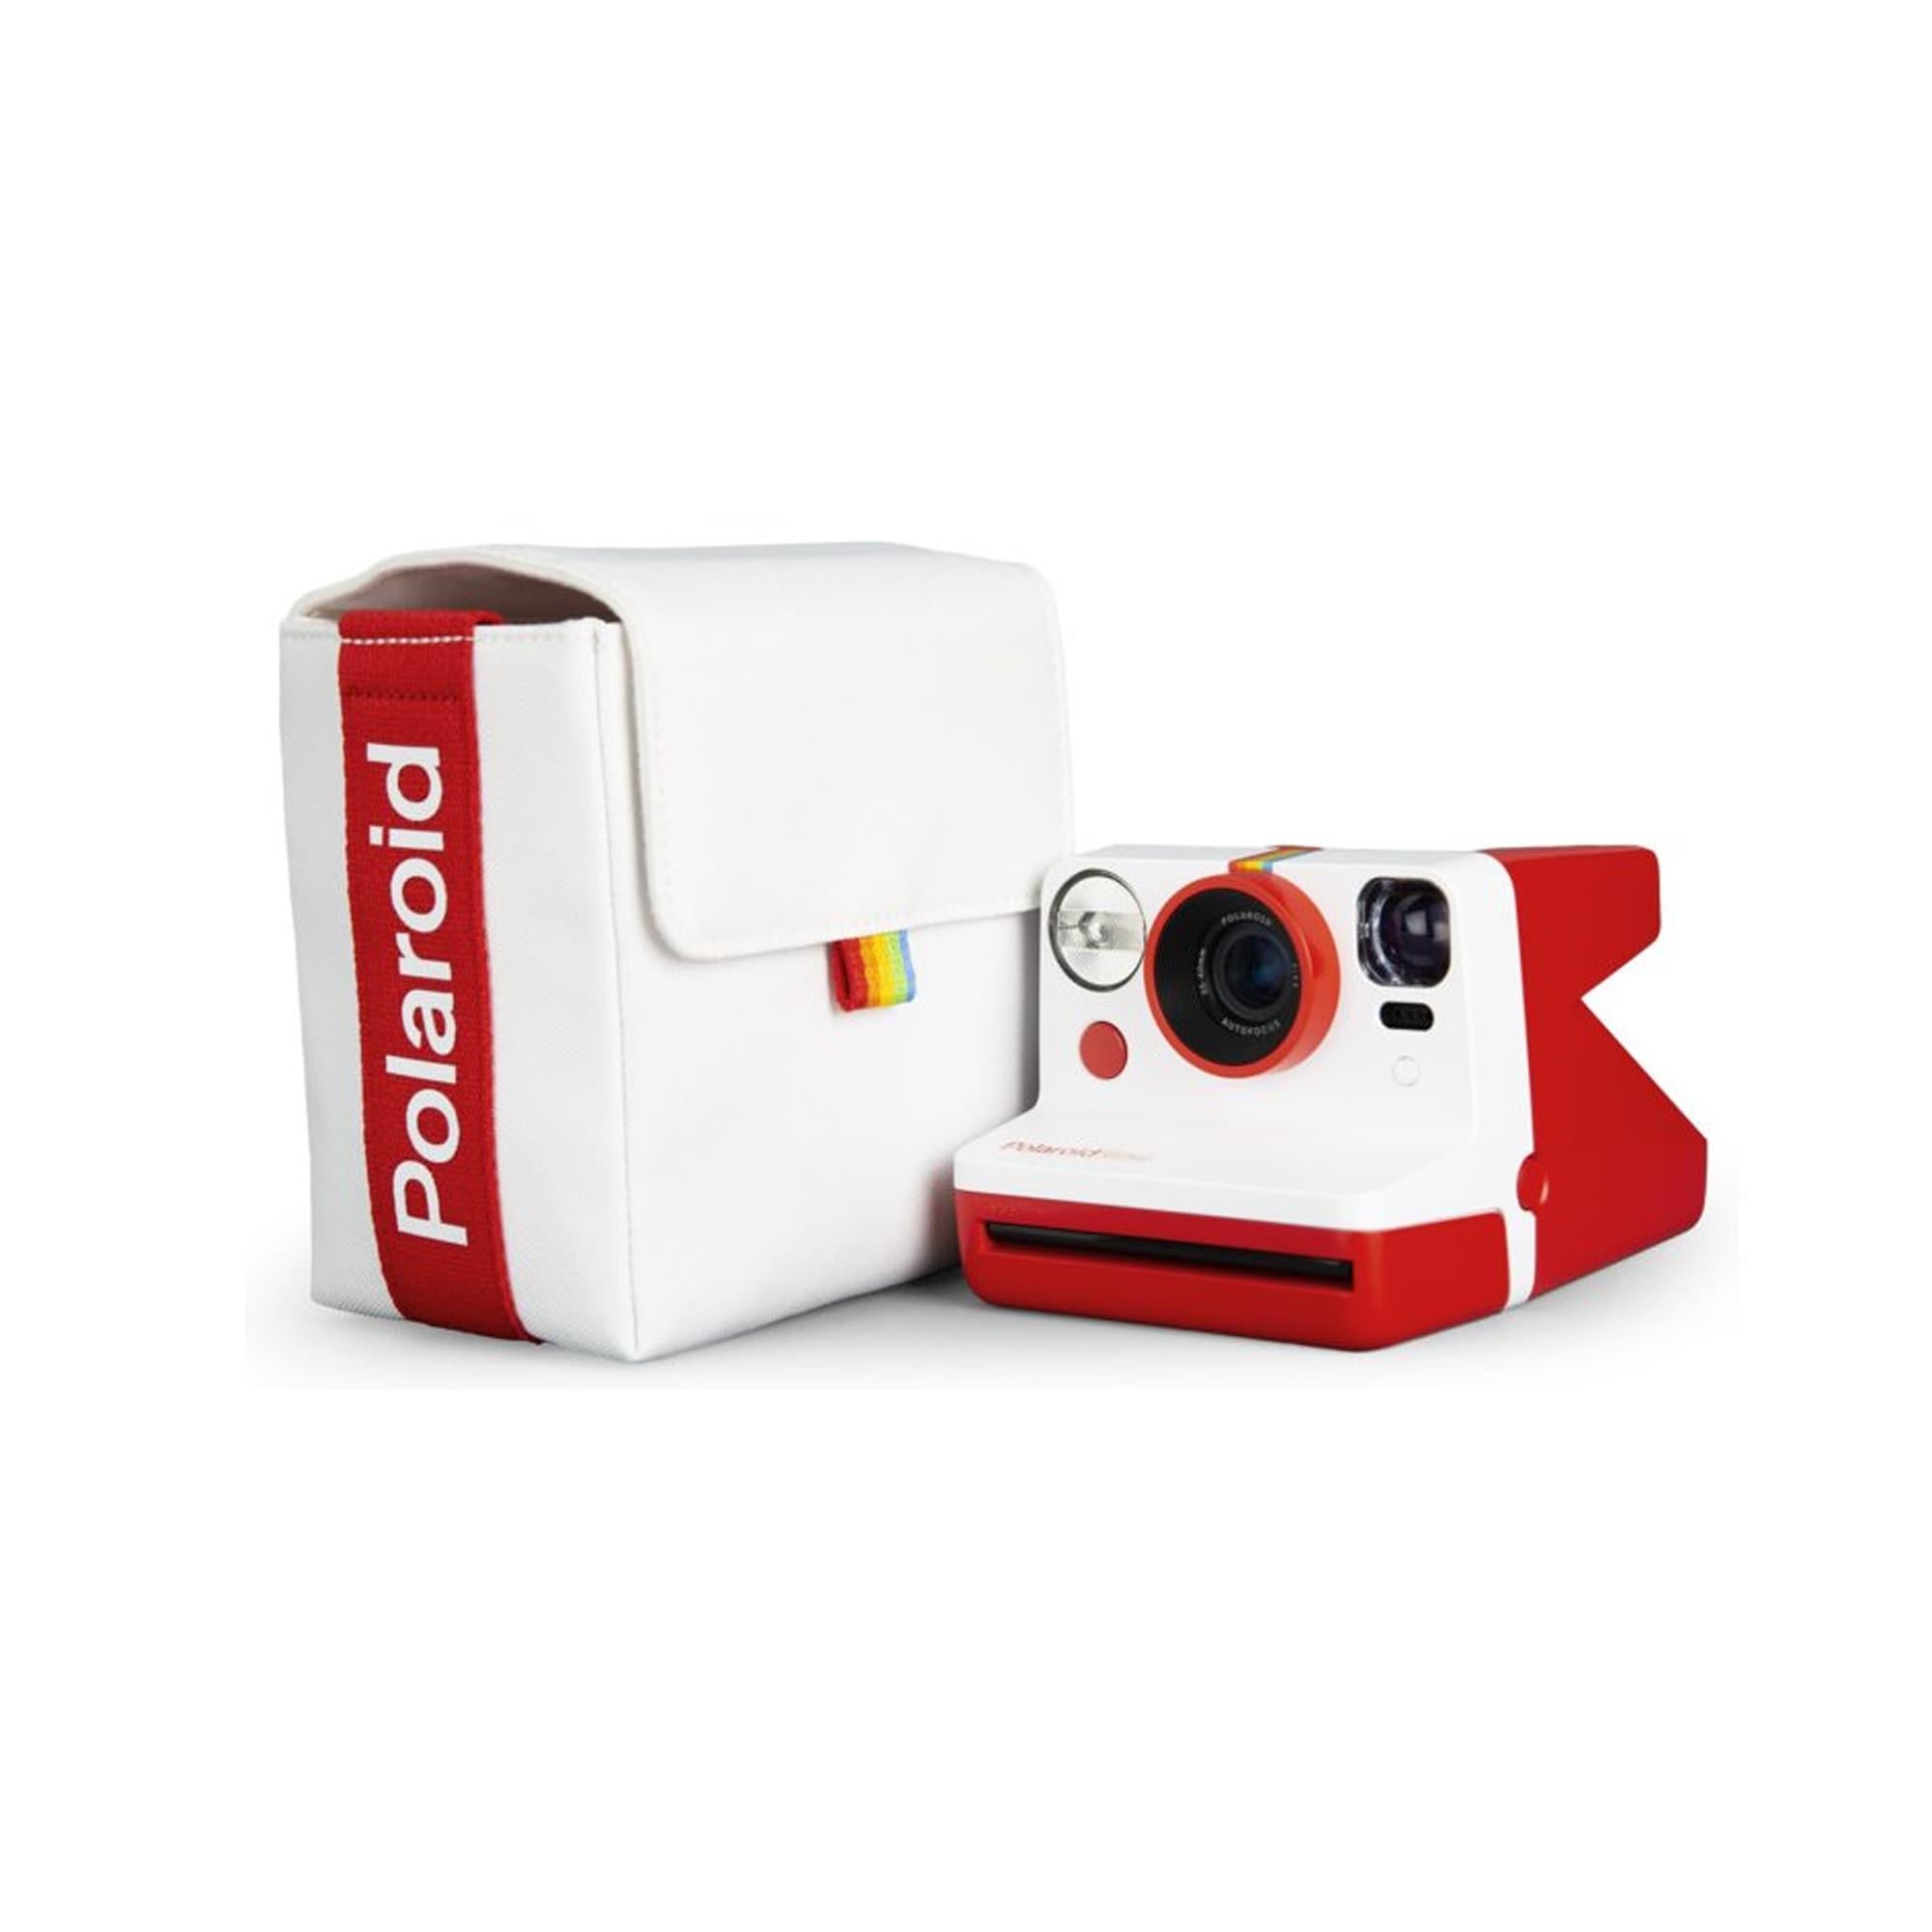 Polaroid Väska Till Now Vit & Röd